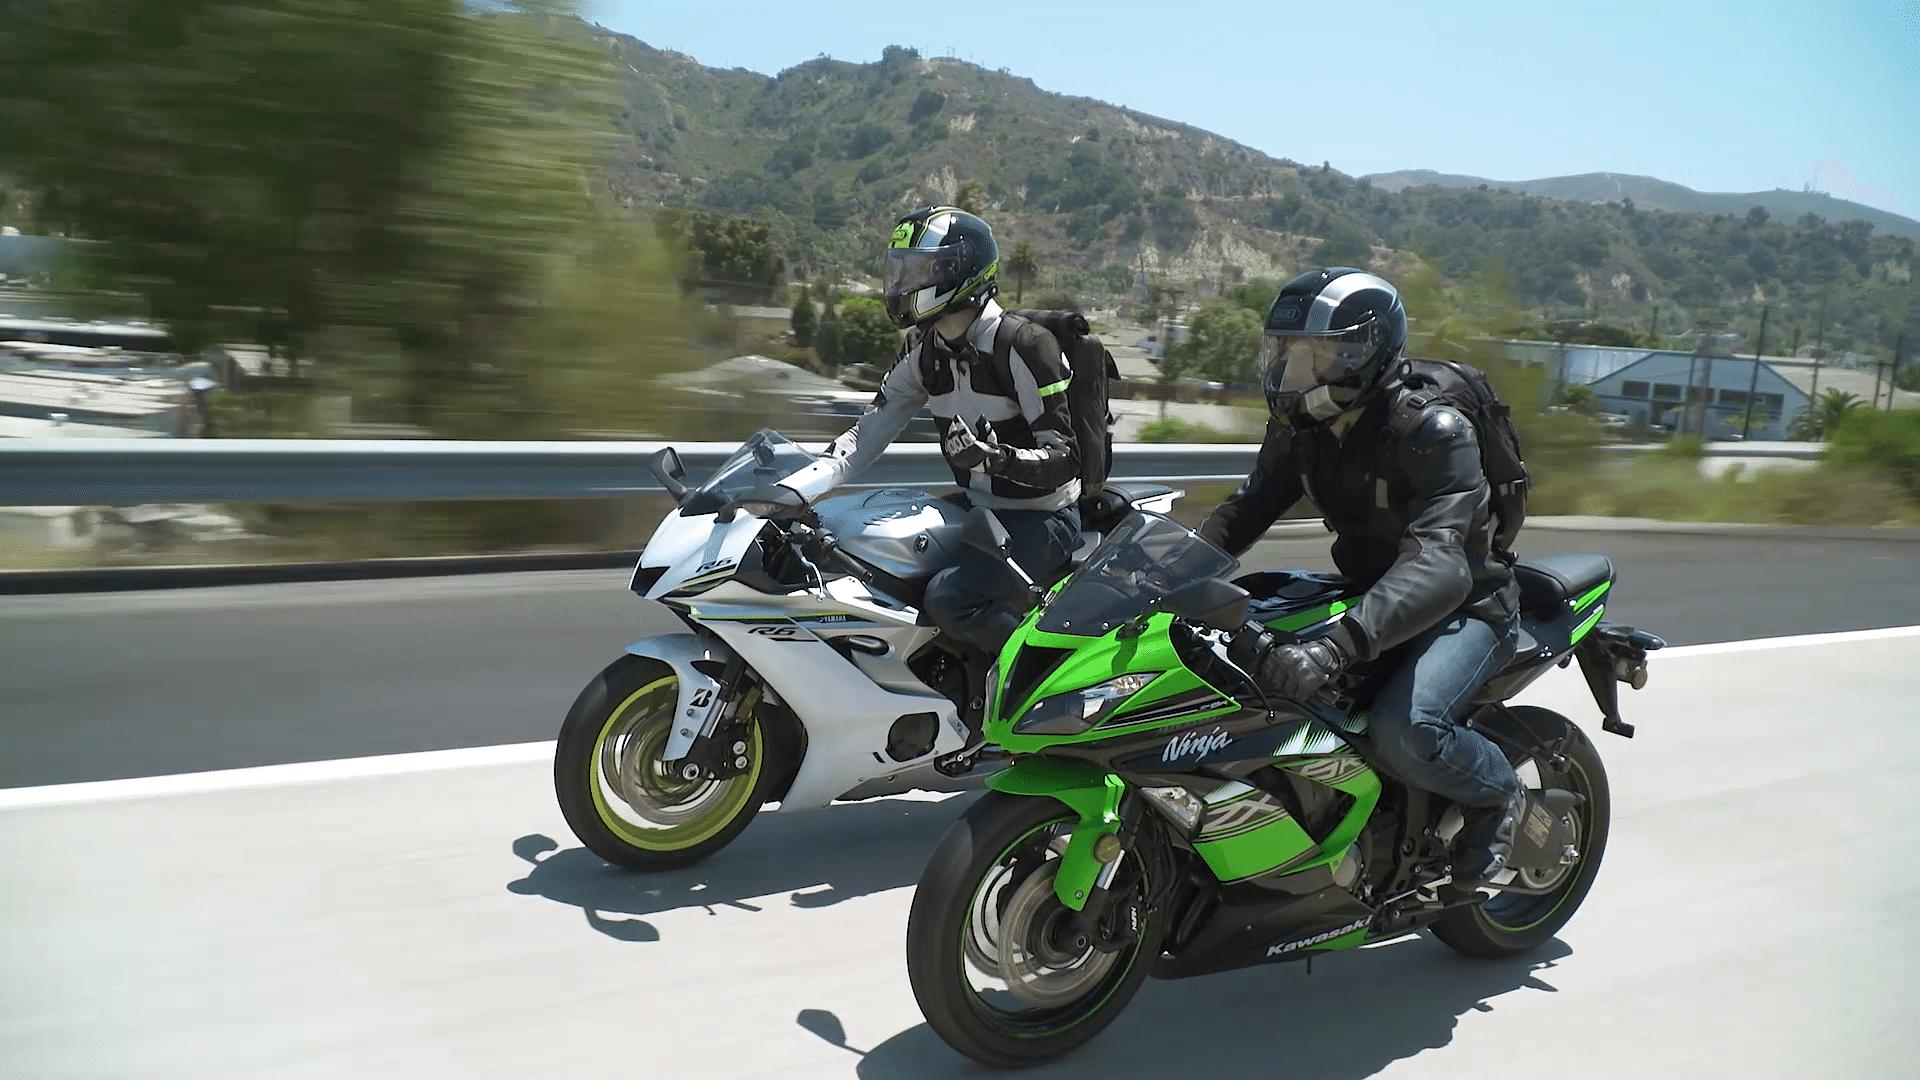 Ari Henning | Motorcyclist